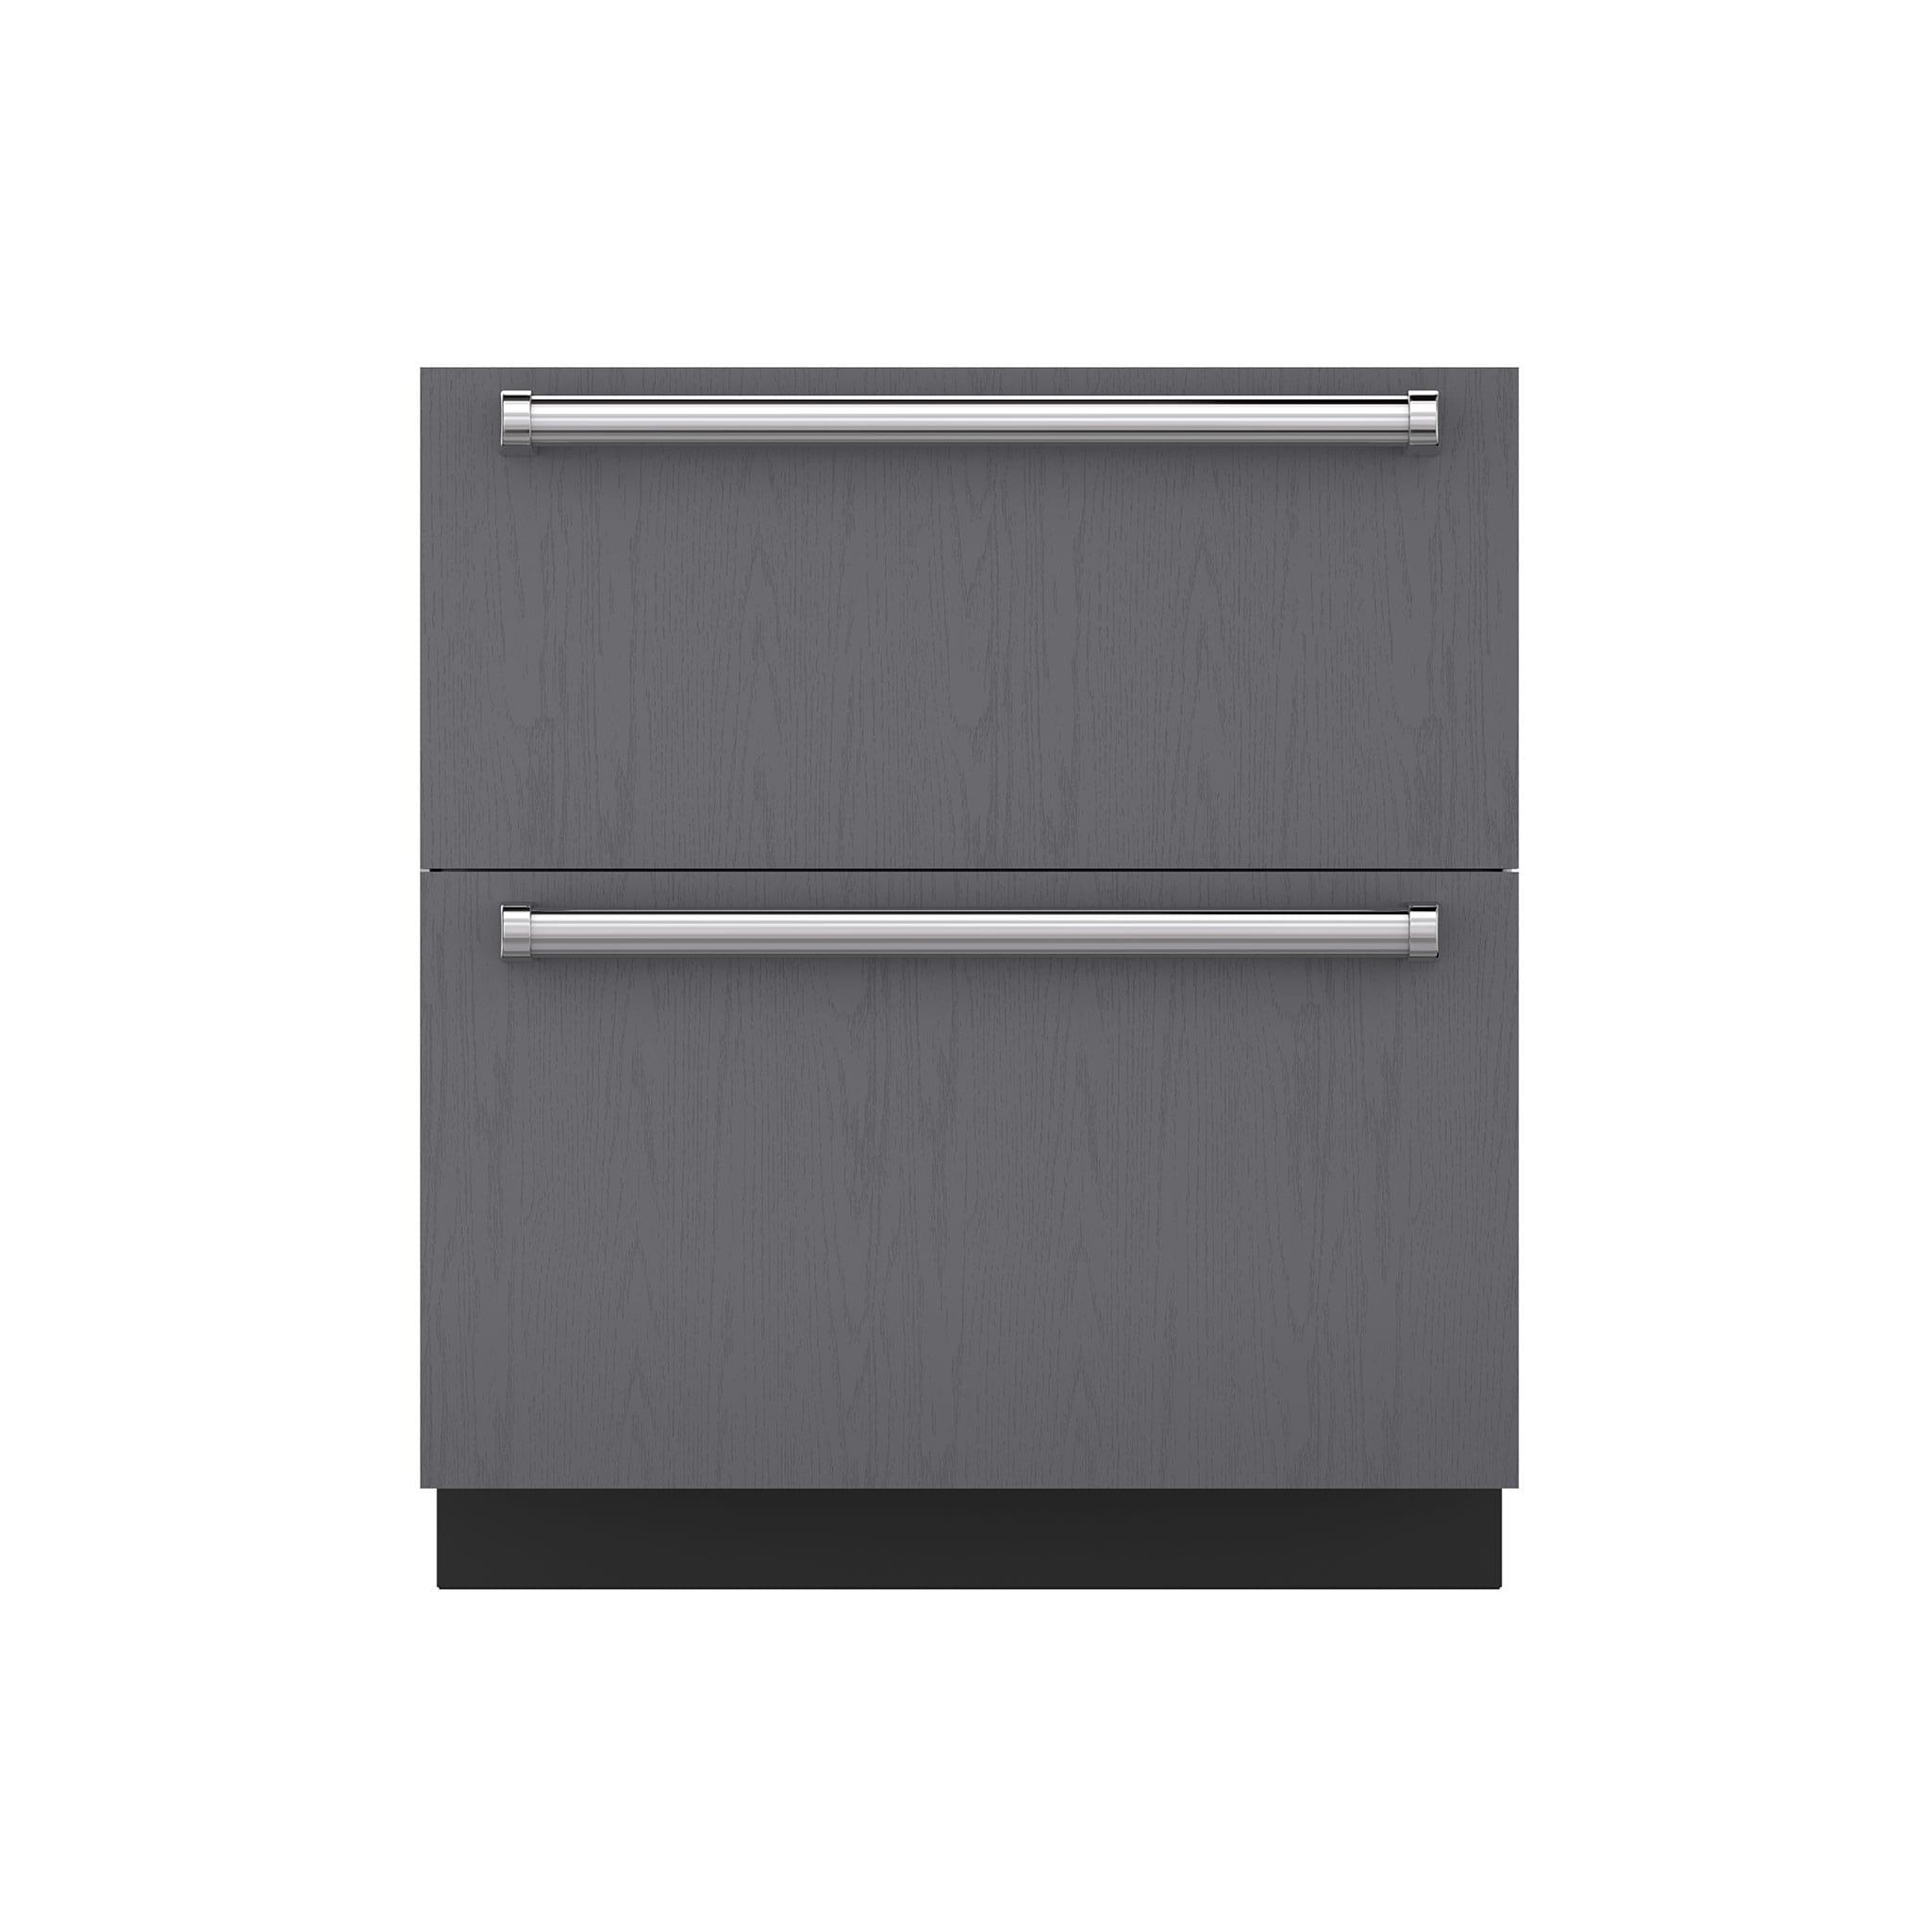 Sub Zero Counter Refrigerator 30 Inch Freezer